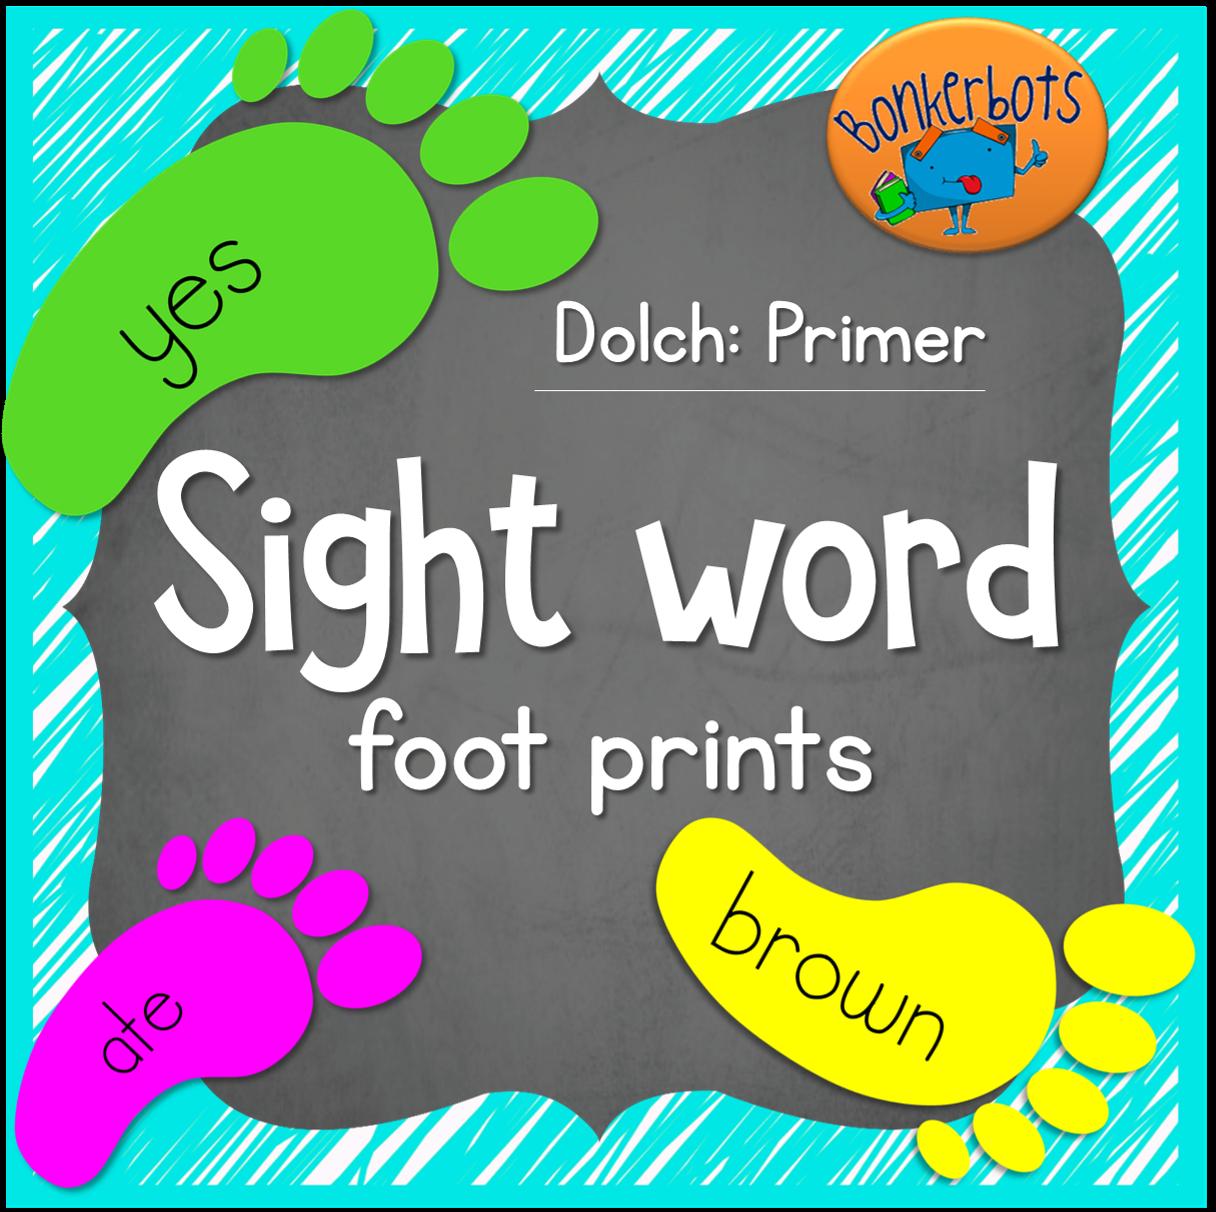 Sight Word Foot Prints Primer